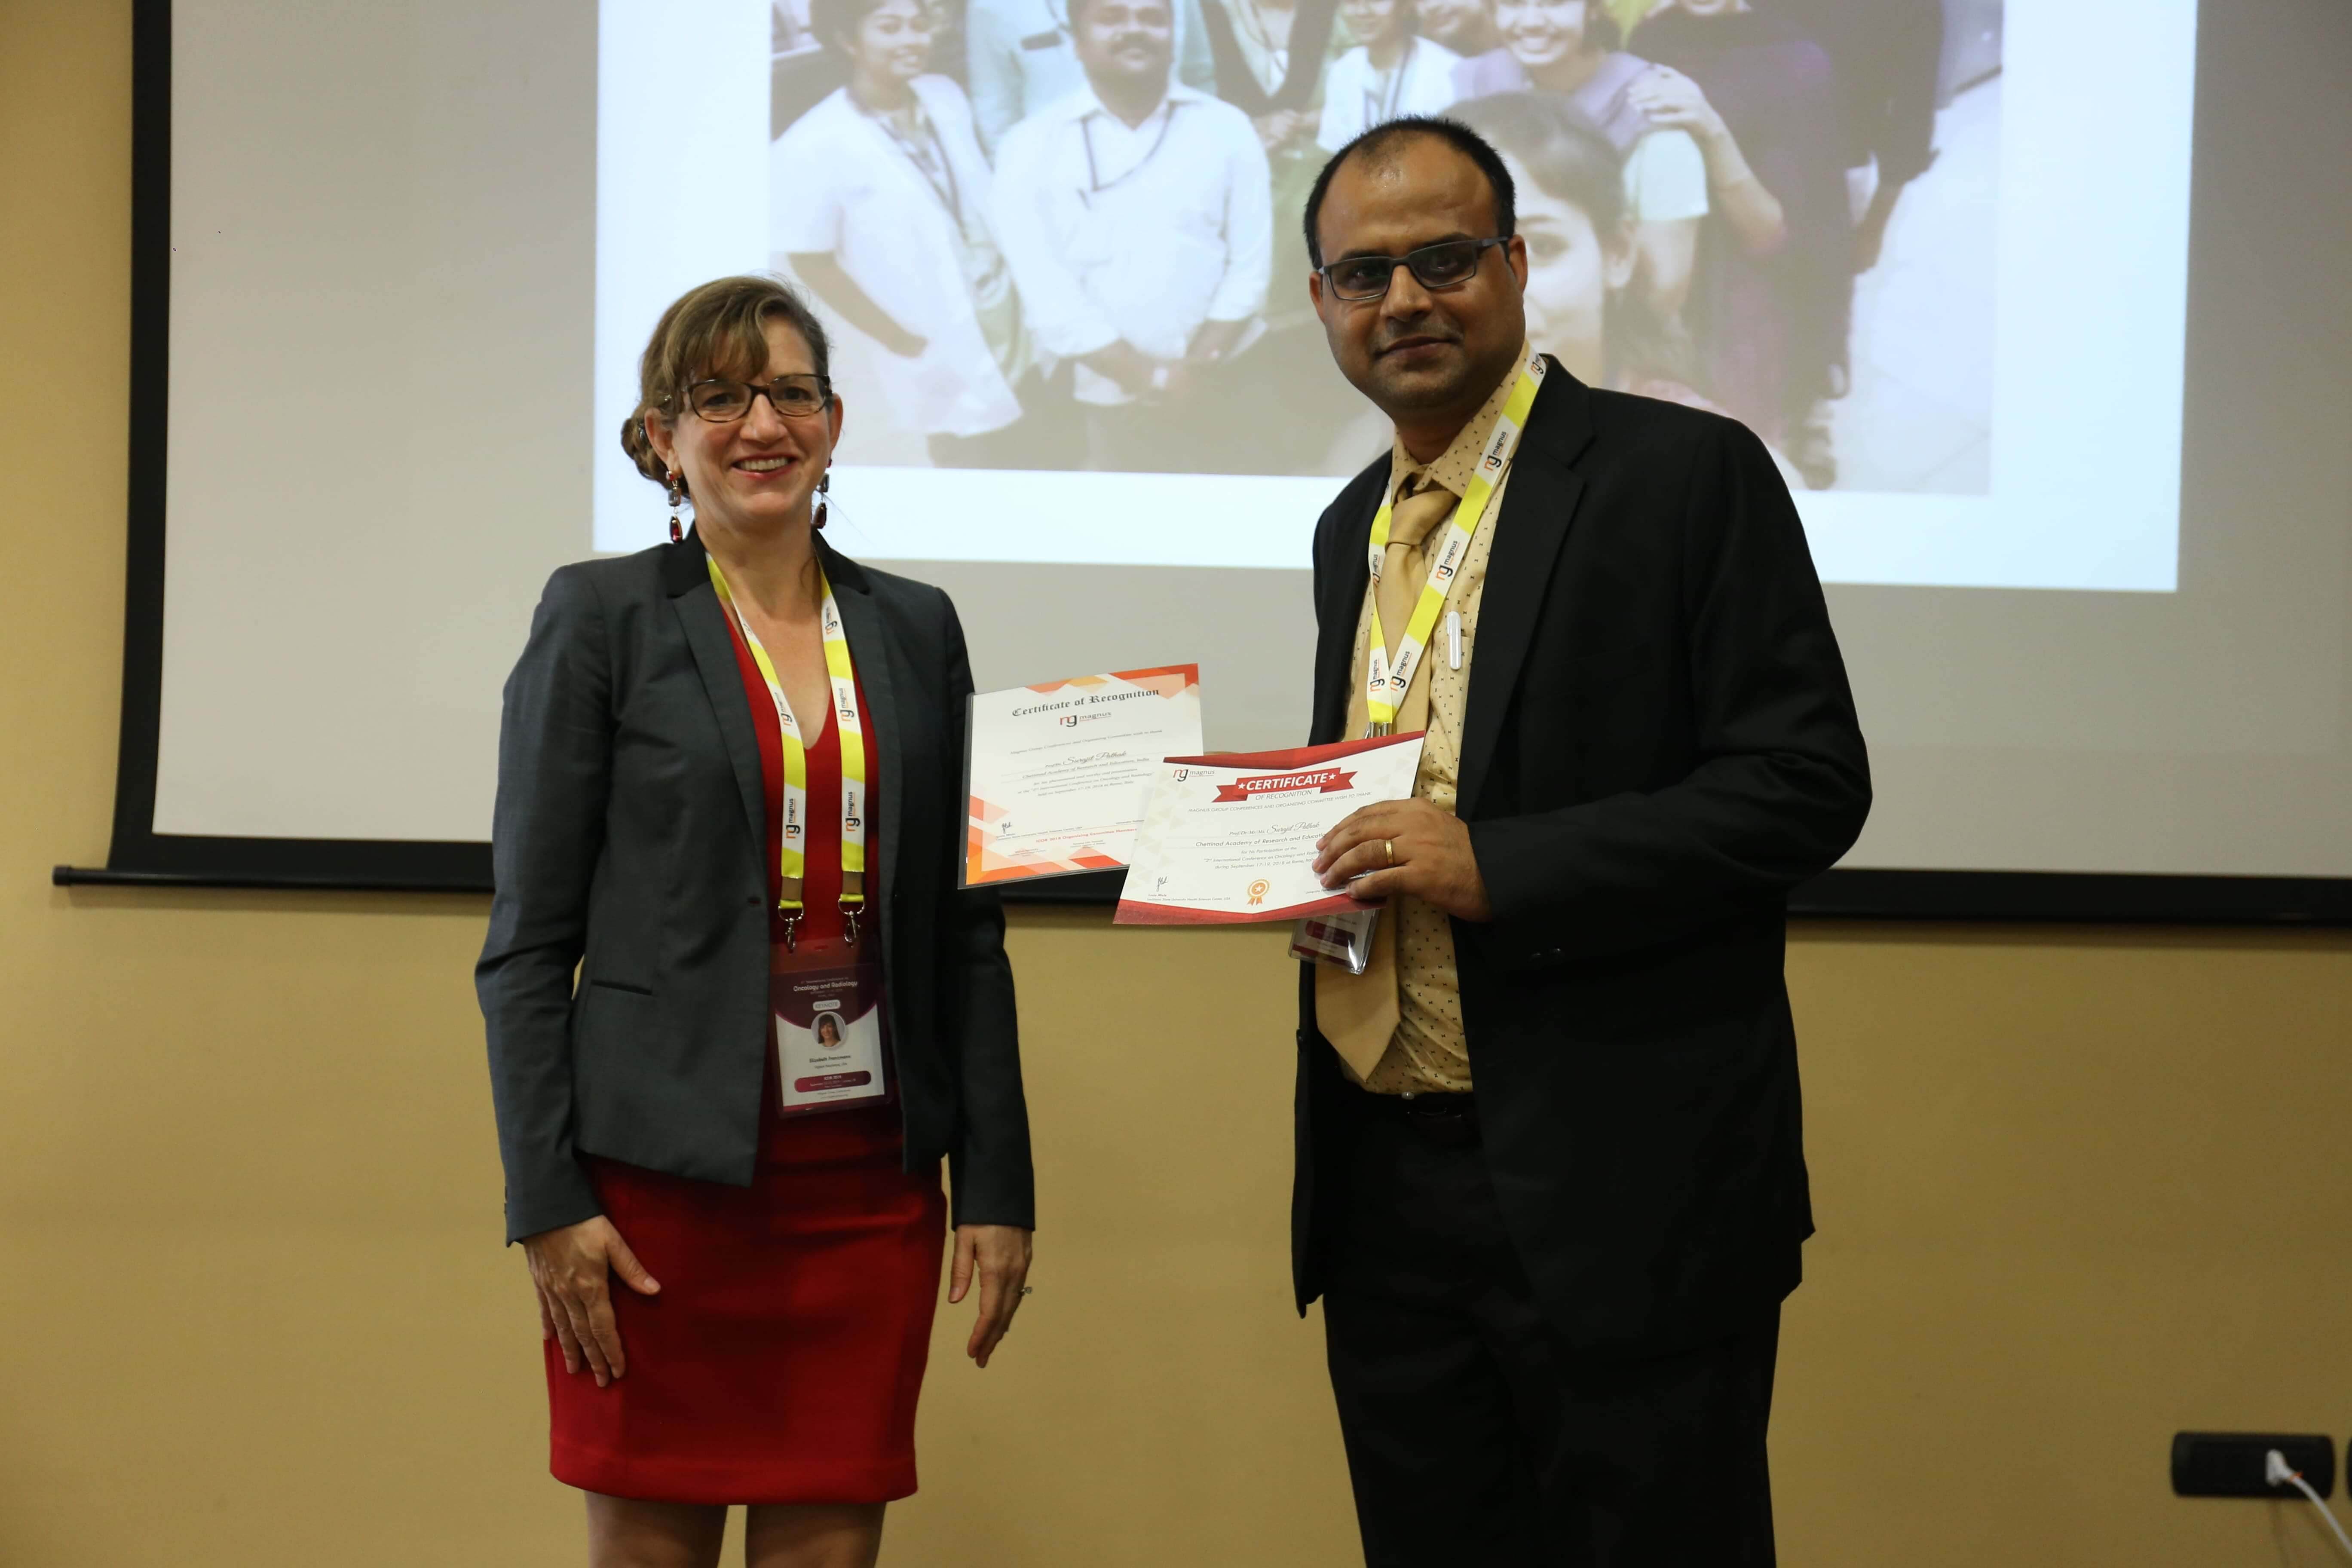 Cancer conference - Surajit Pathak